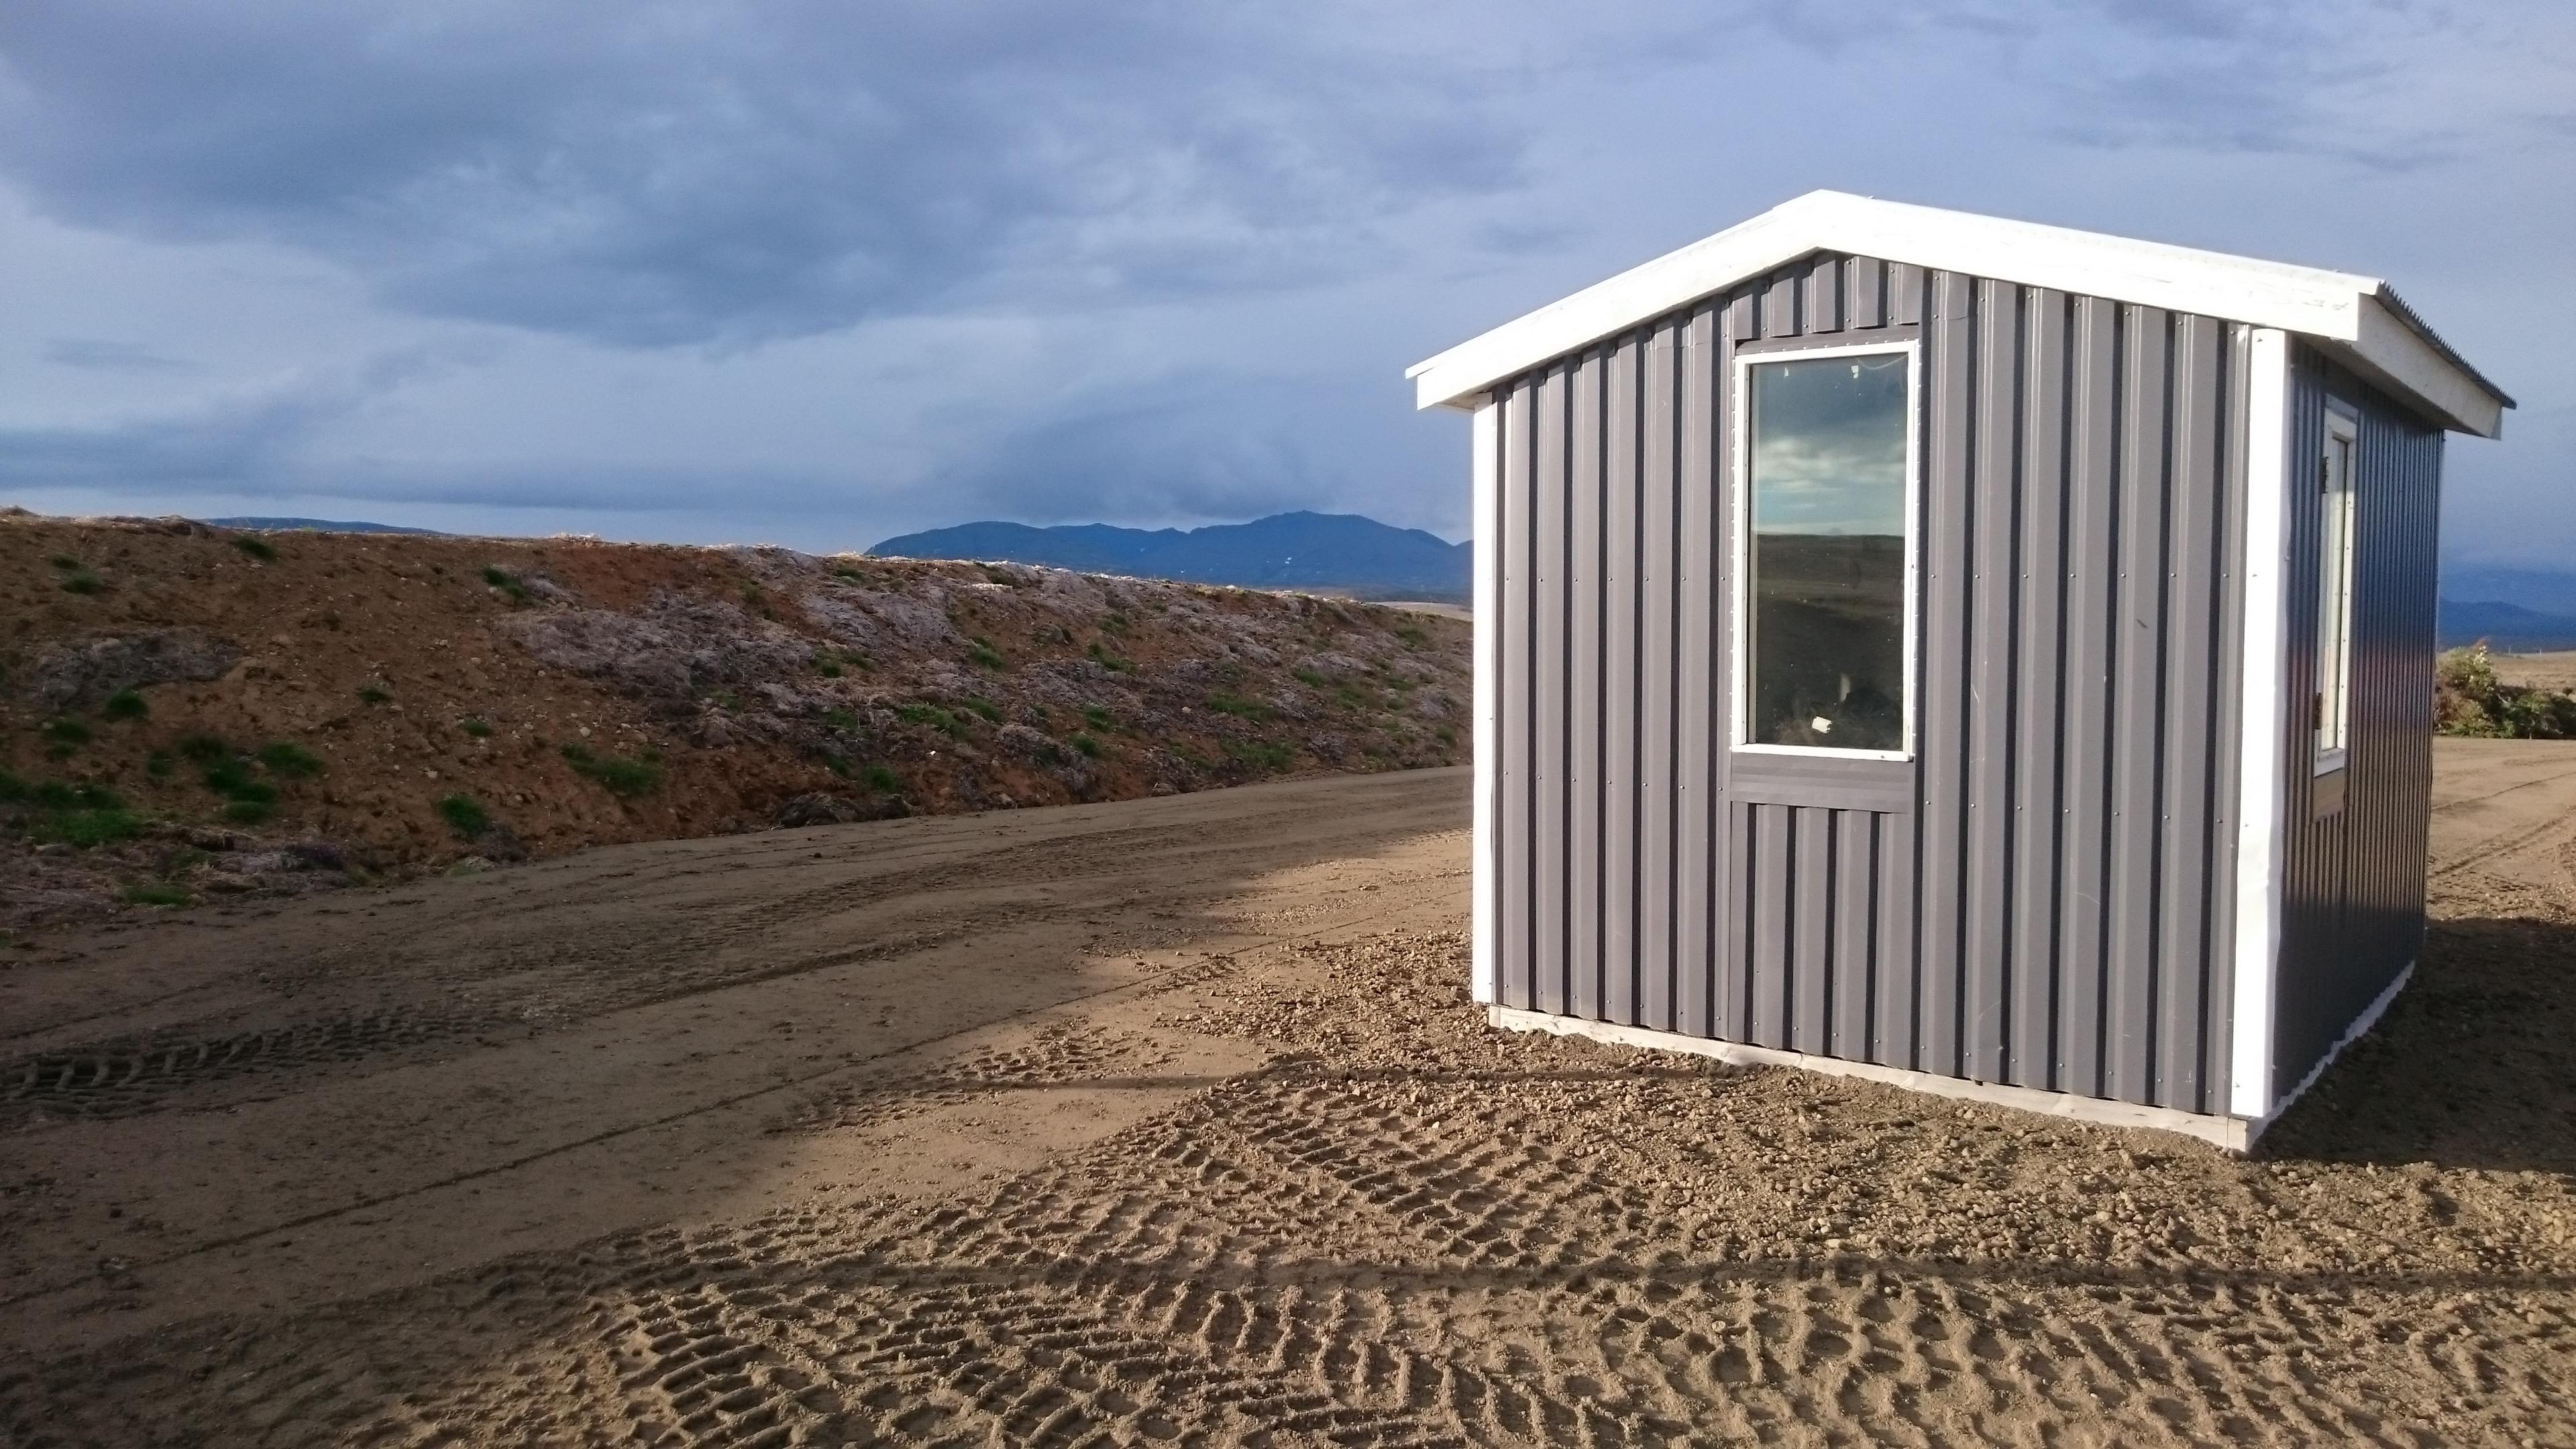 Cabane paysage camping-car